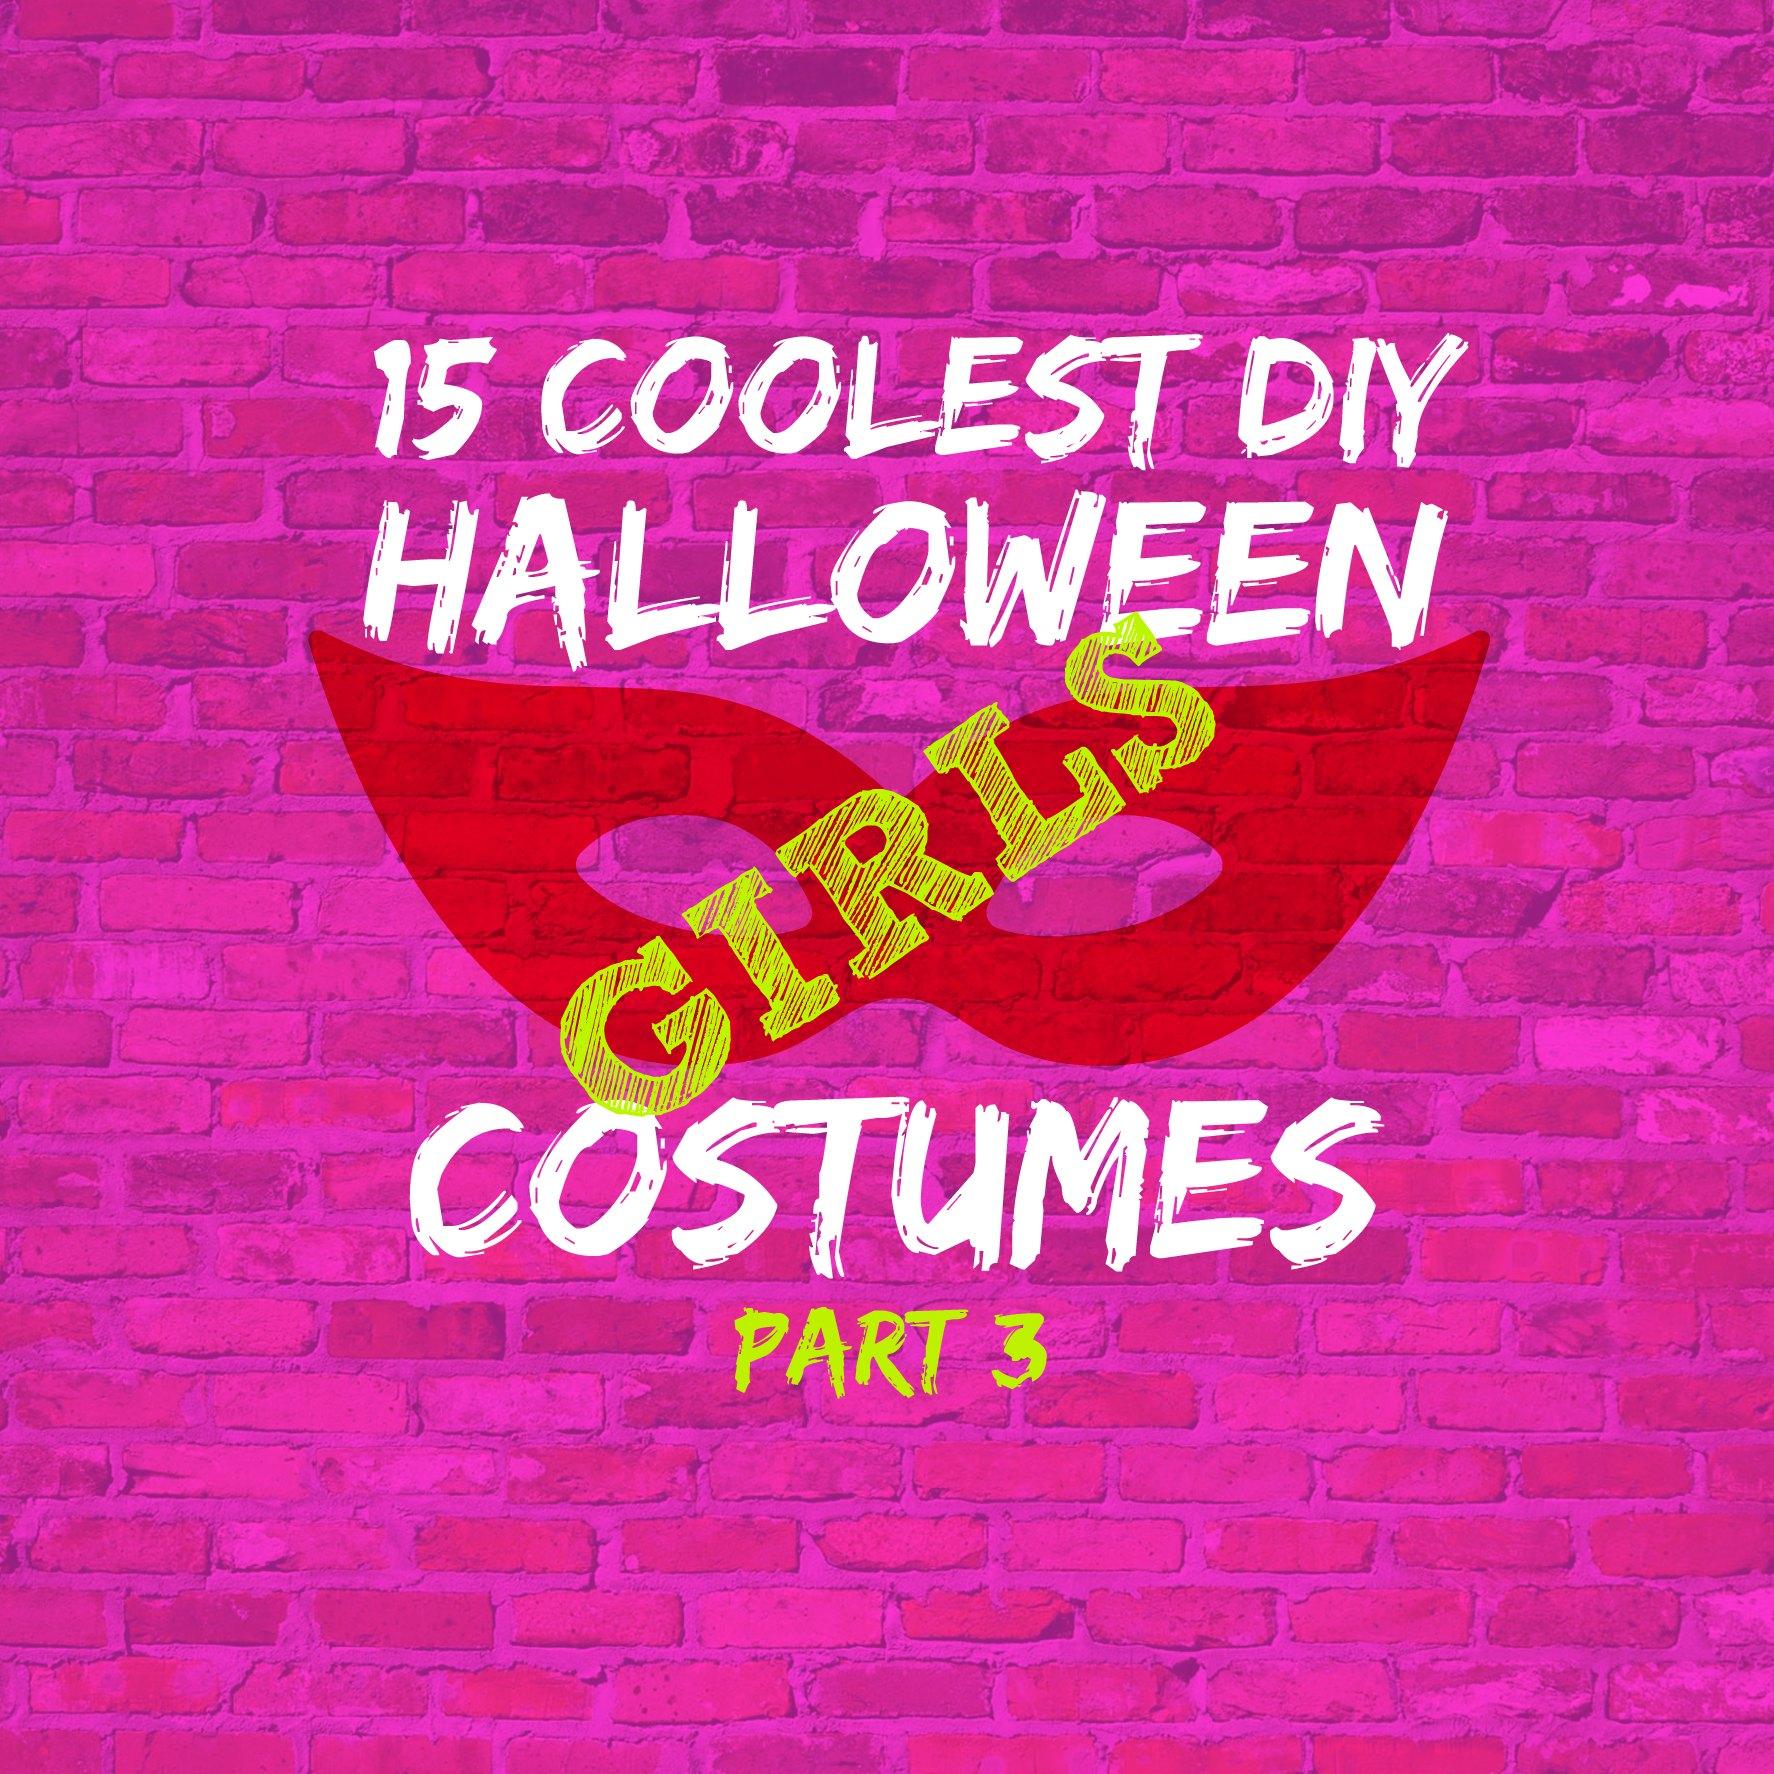 15 Coolest Halloween Girls Costumes Part 3